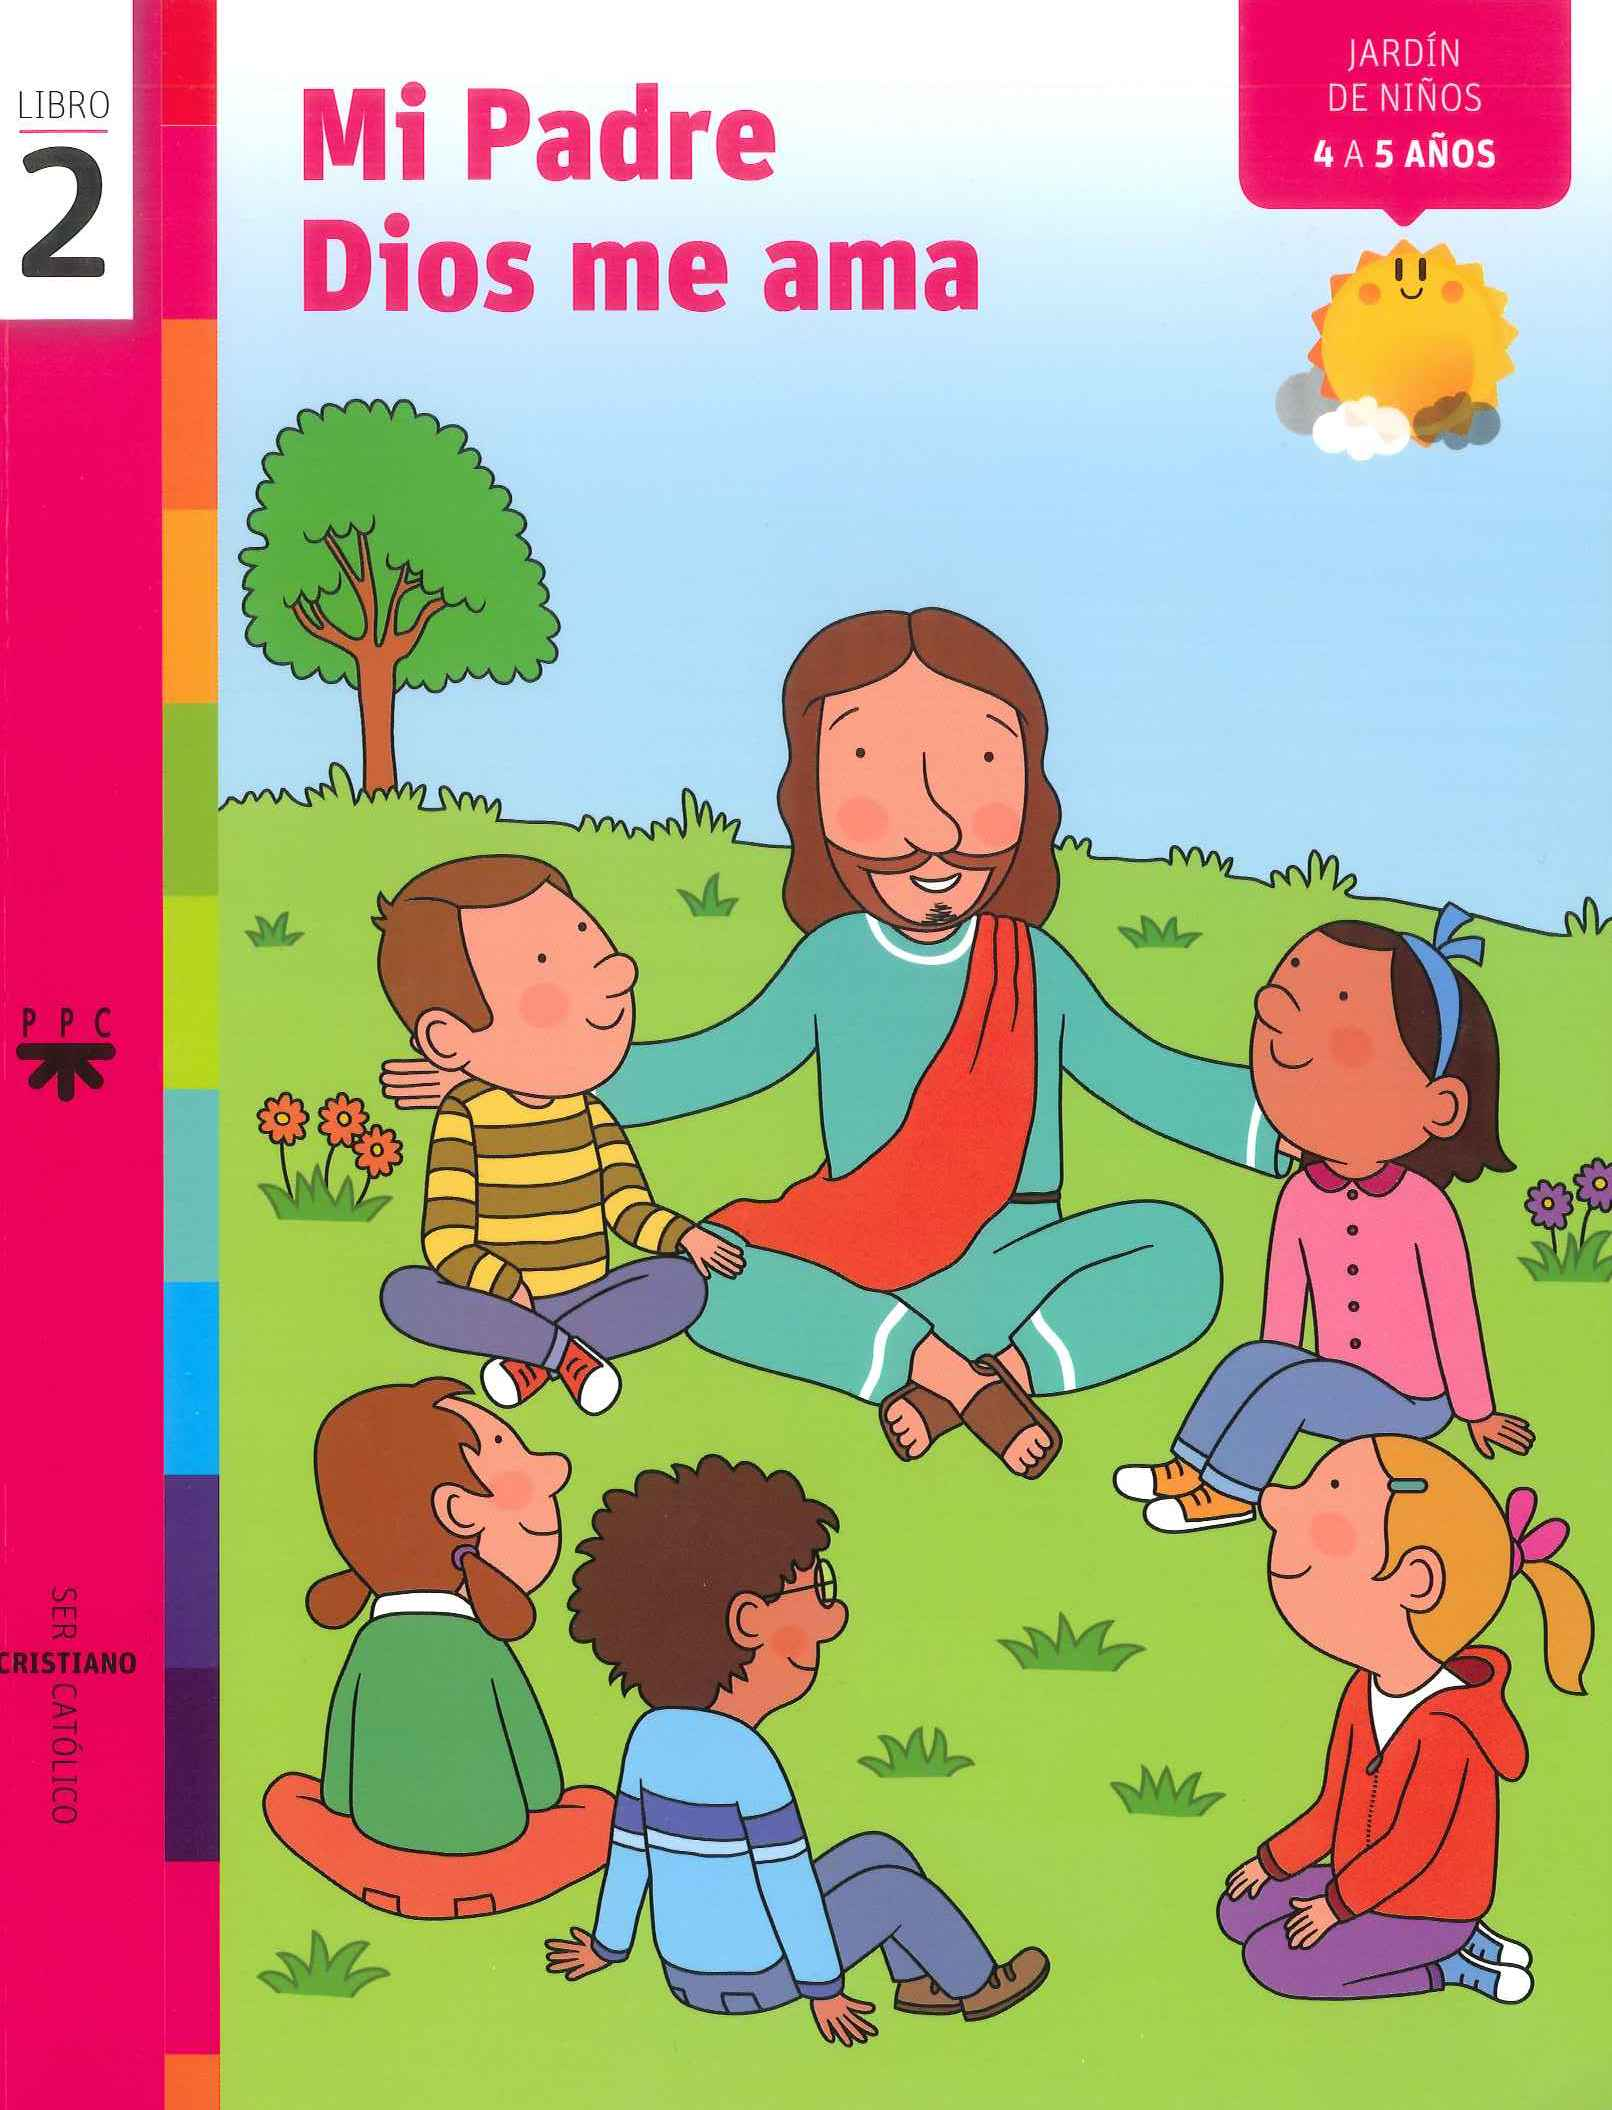 Mi Padre Dios me ama, 2. Ser cristiano católico